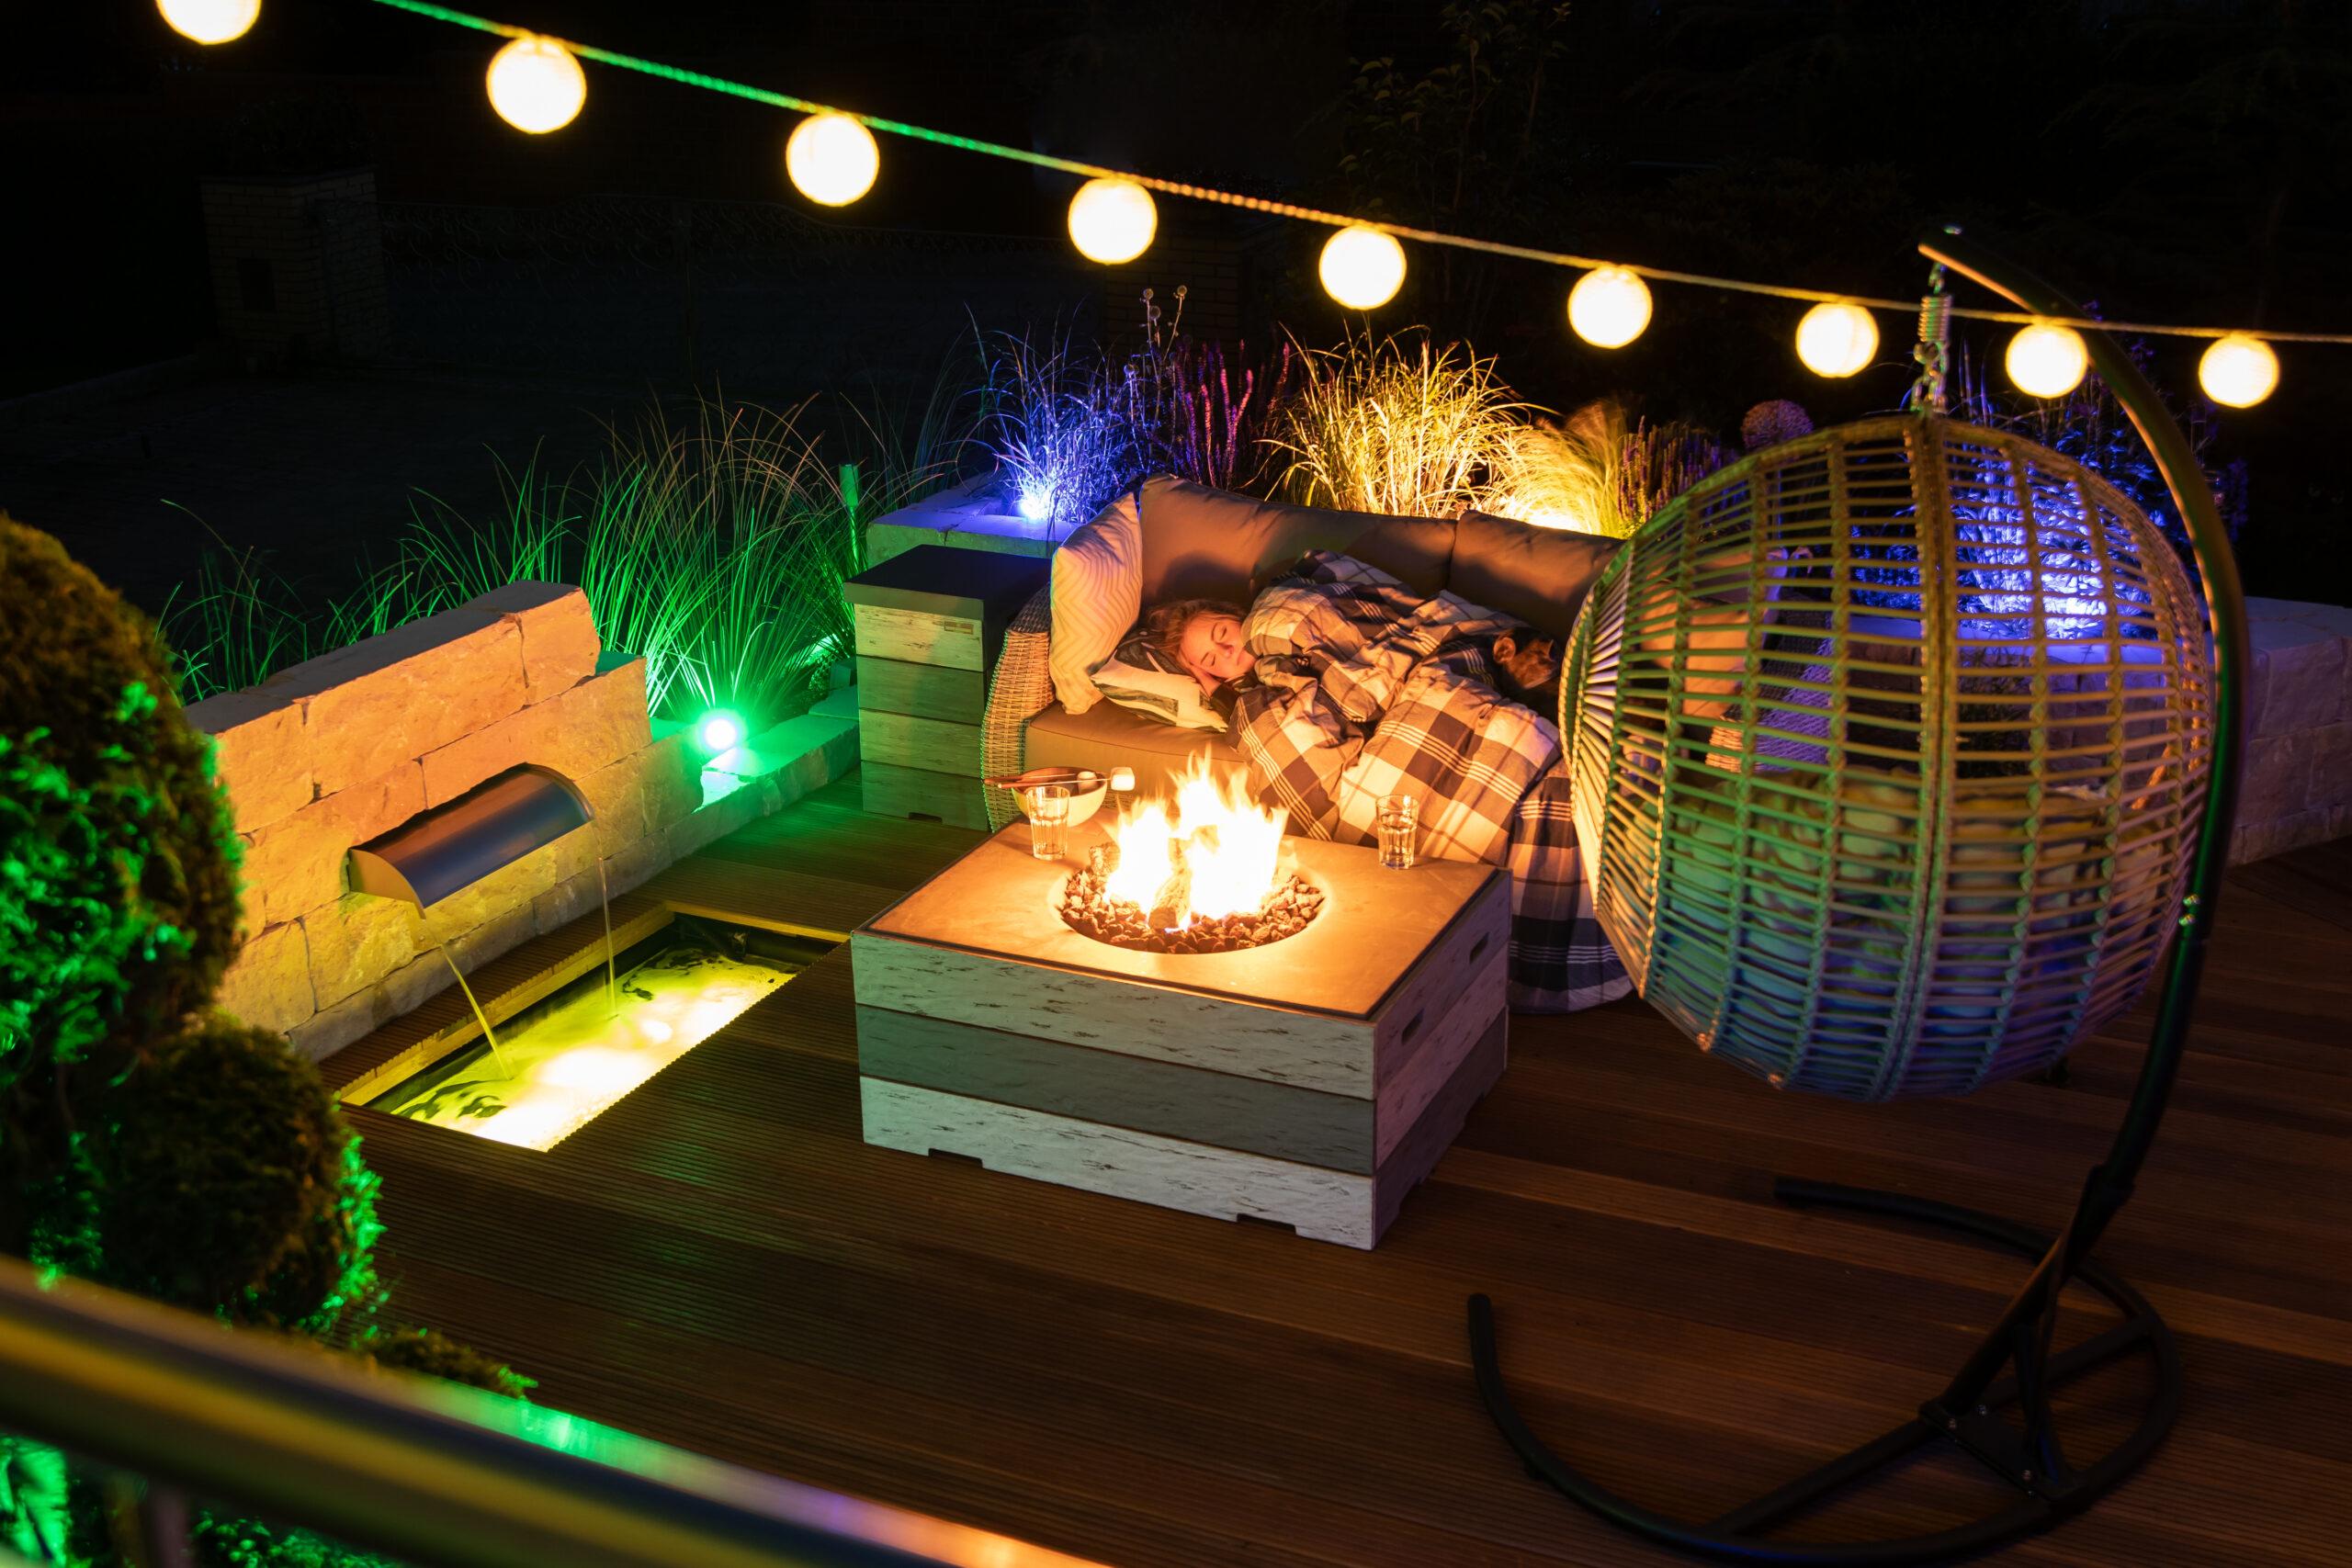 Kuschelatmosphäre am Feuertisch